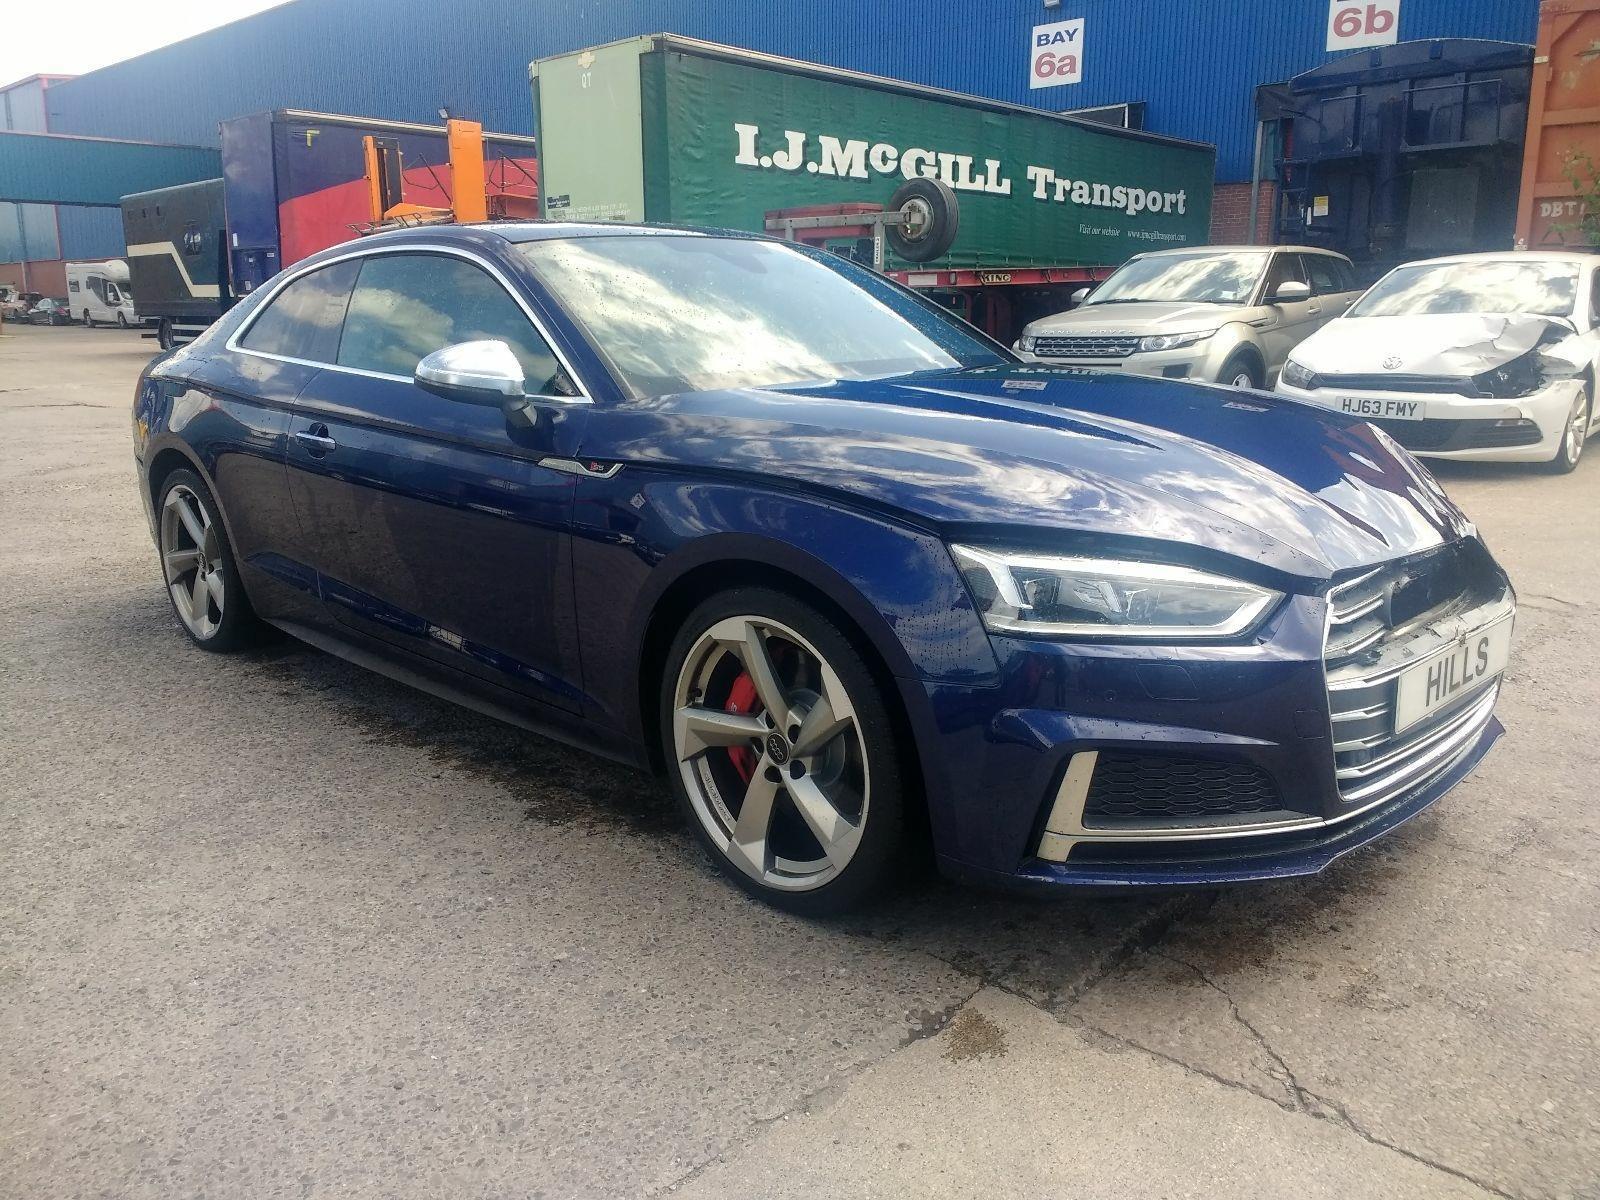 2017 Audi A5 S5 TFSI QUATTRO 2995cc TURBO Petrol Automatic 8 Speed COUPE